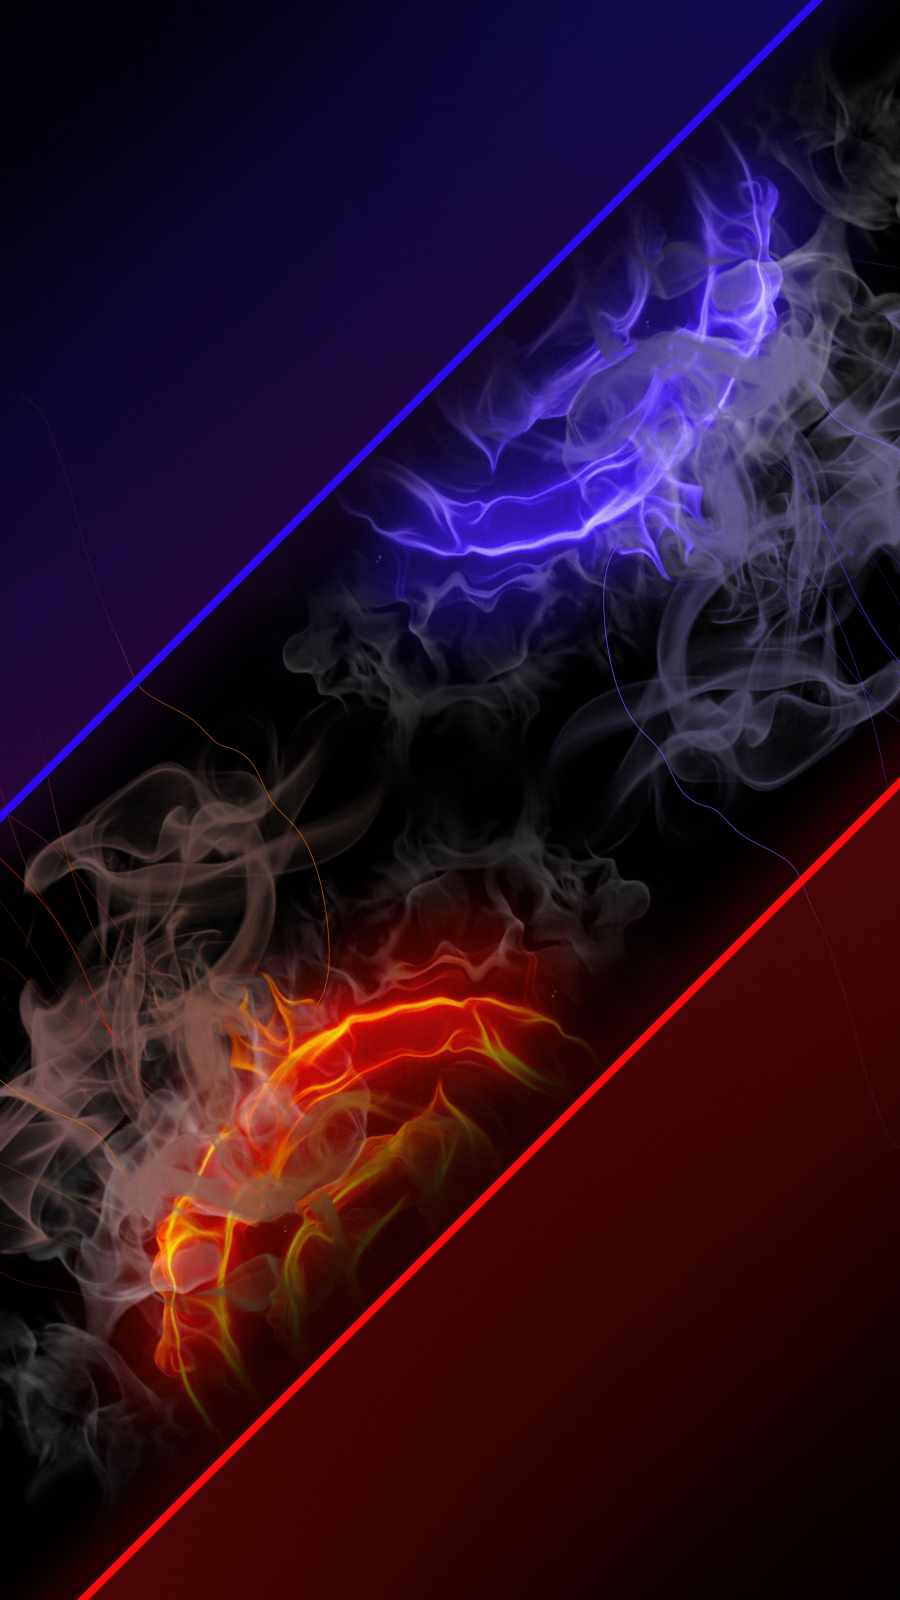 Neon Smoke iPhone Wallpaper